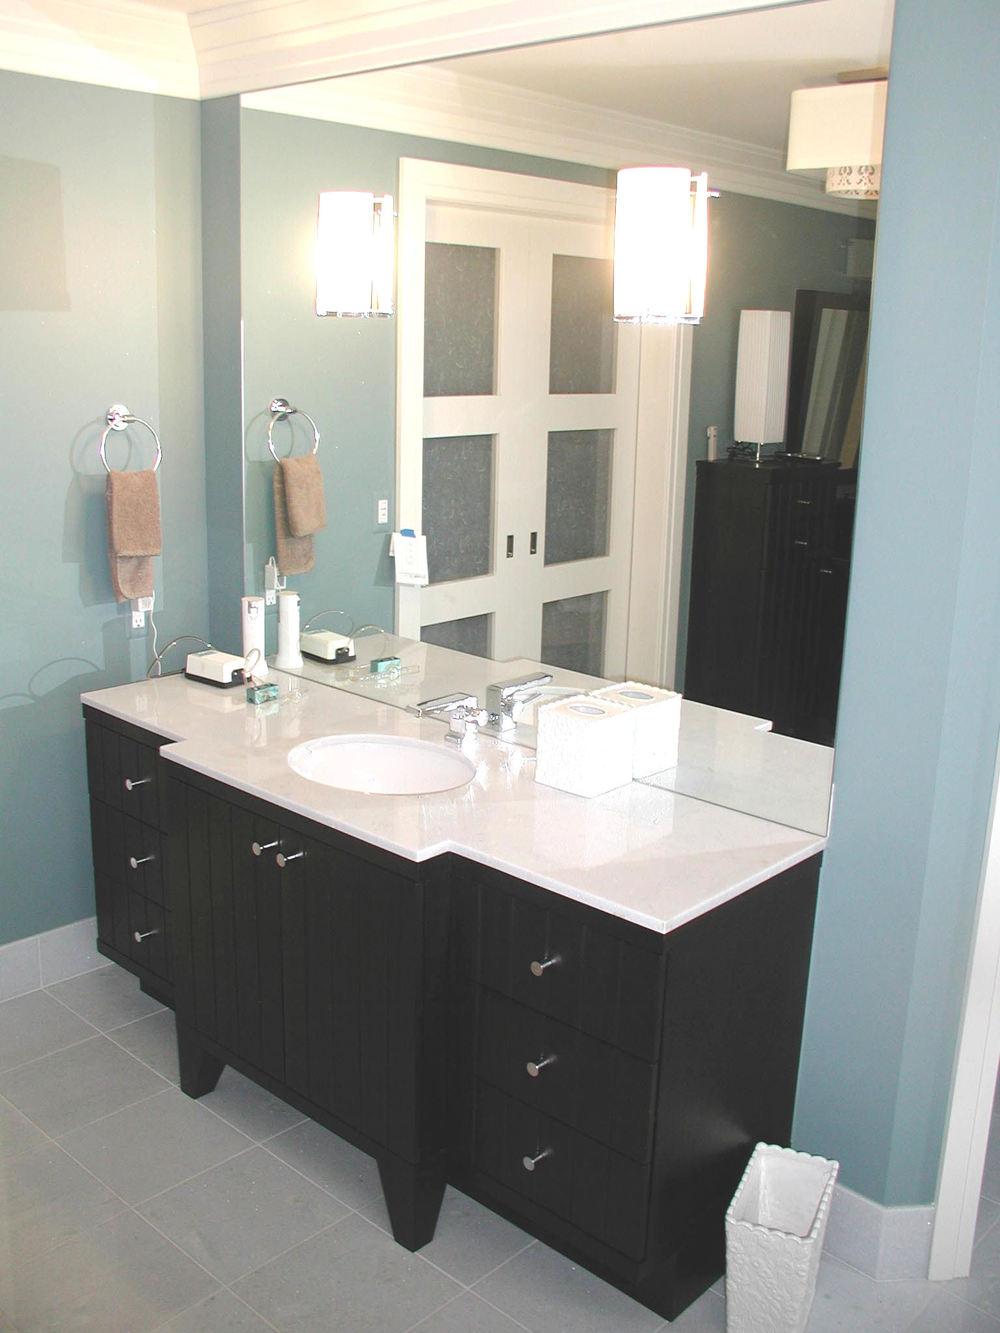 Find Cabinets To Remodel Amp Design Your Bathroom